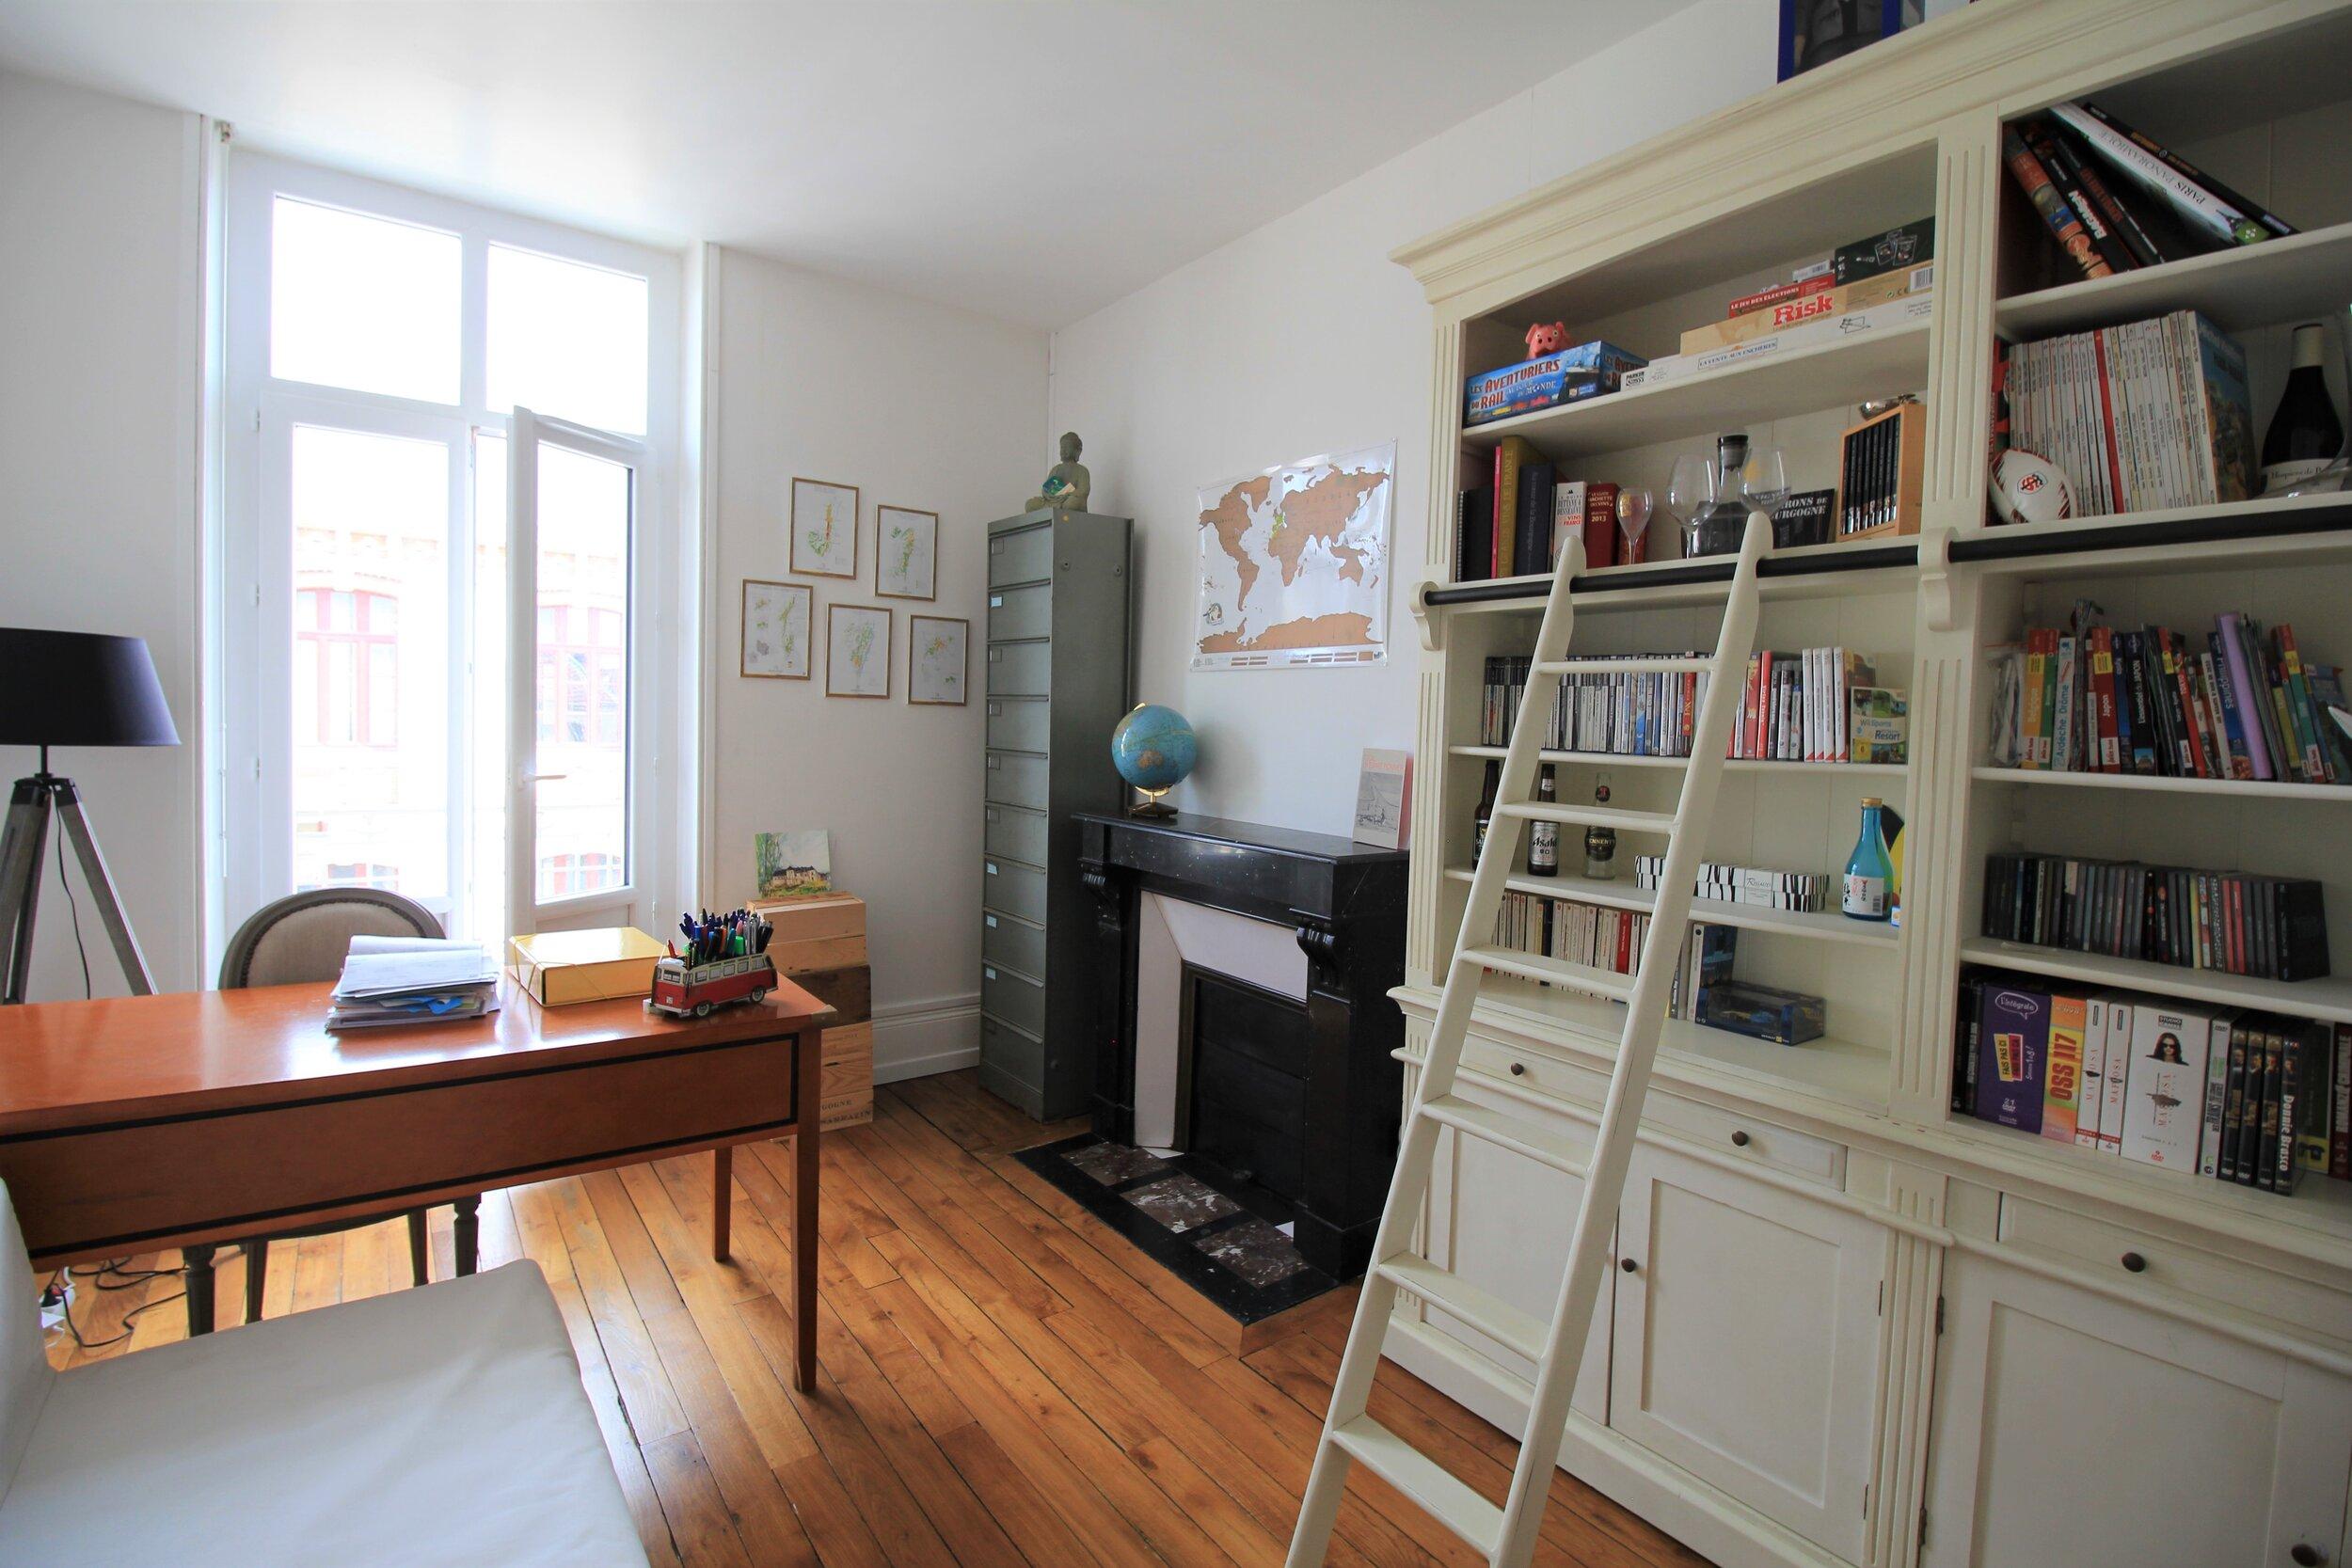 Appartement bourgeois  Dijon - Antiquaires Appartement 82 m² - 2 chambres - 275 000 €